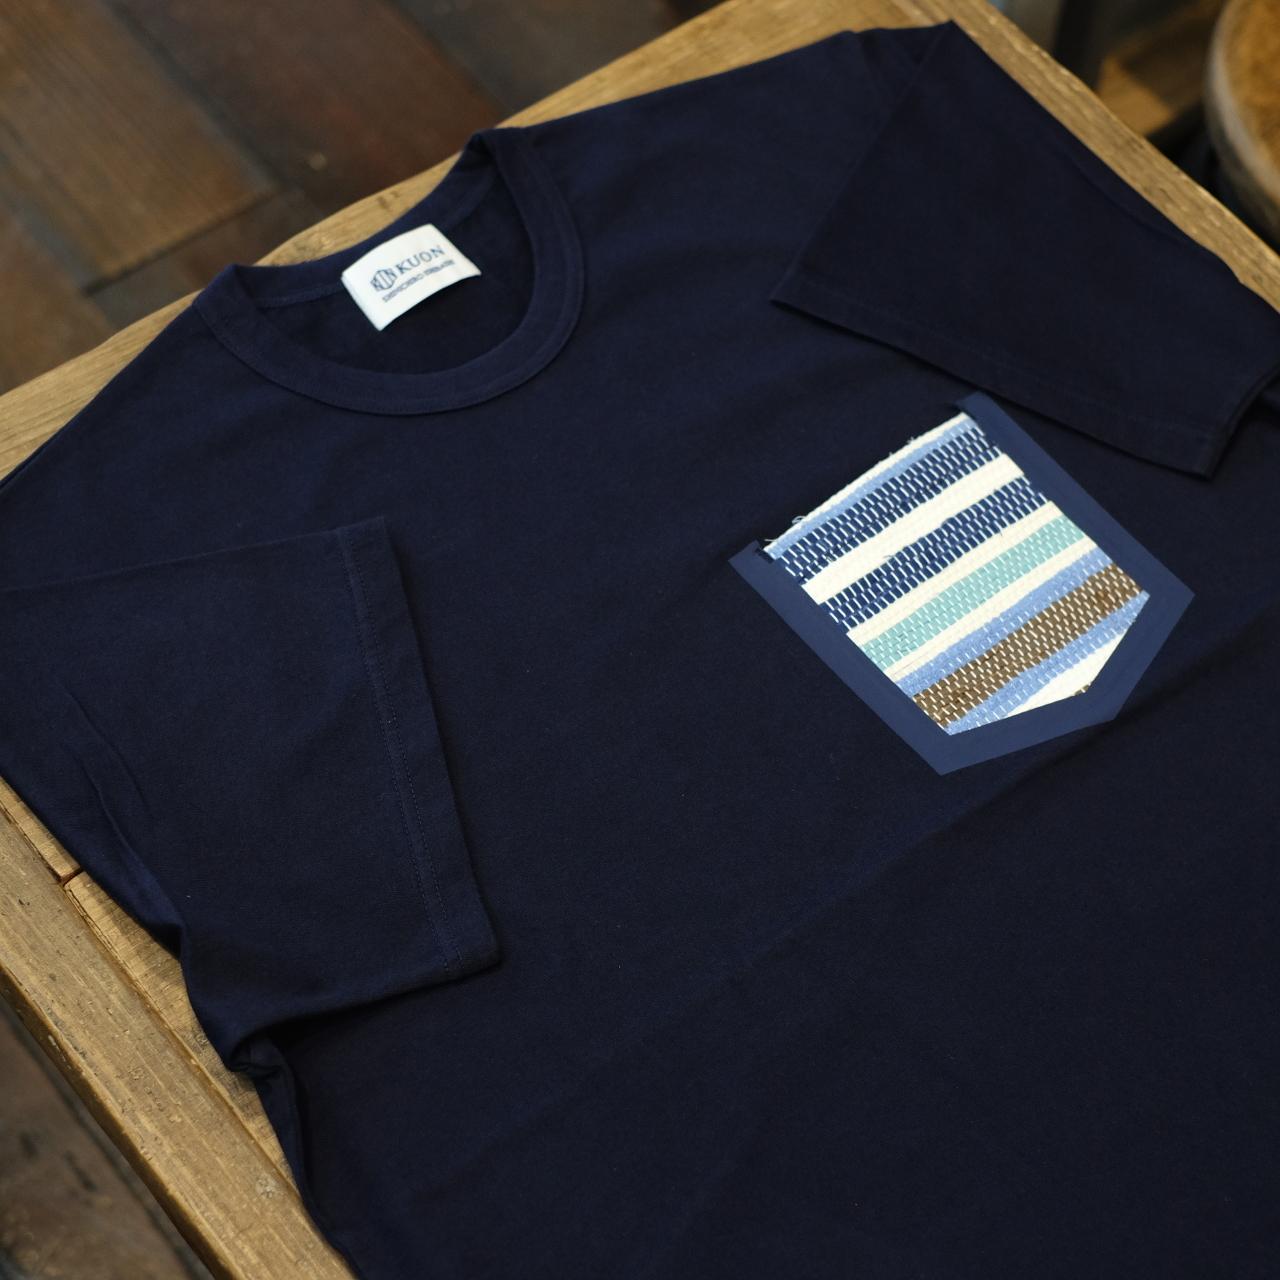 KUON(クオン) 裂織りポケットTシャツ ダークネイビー